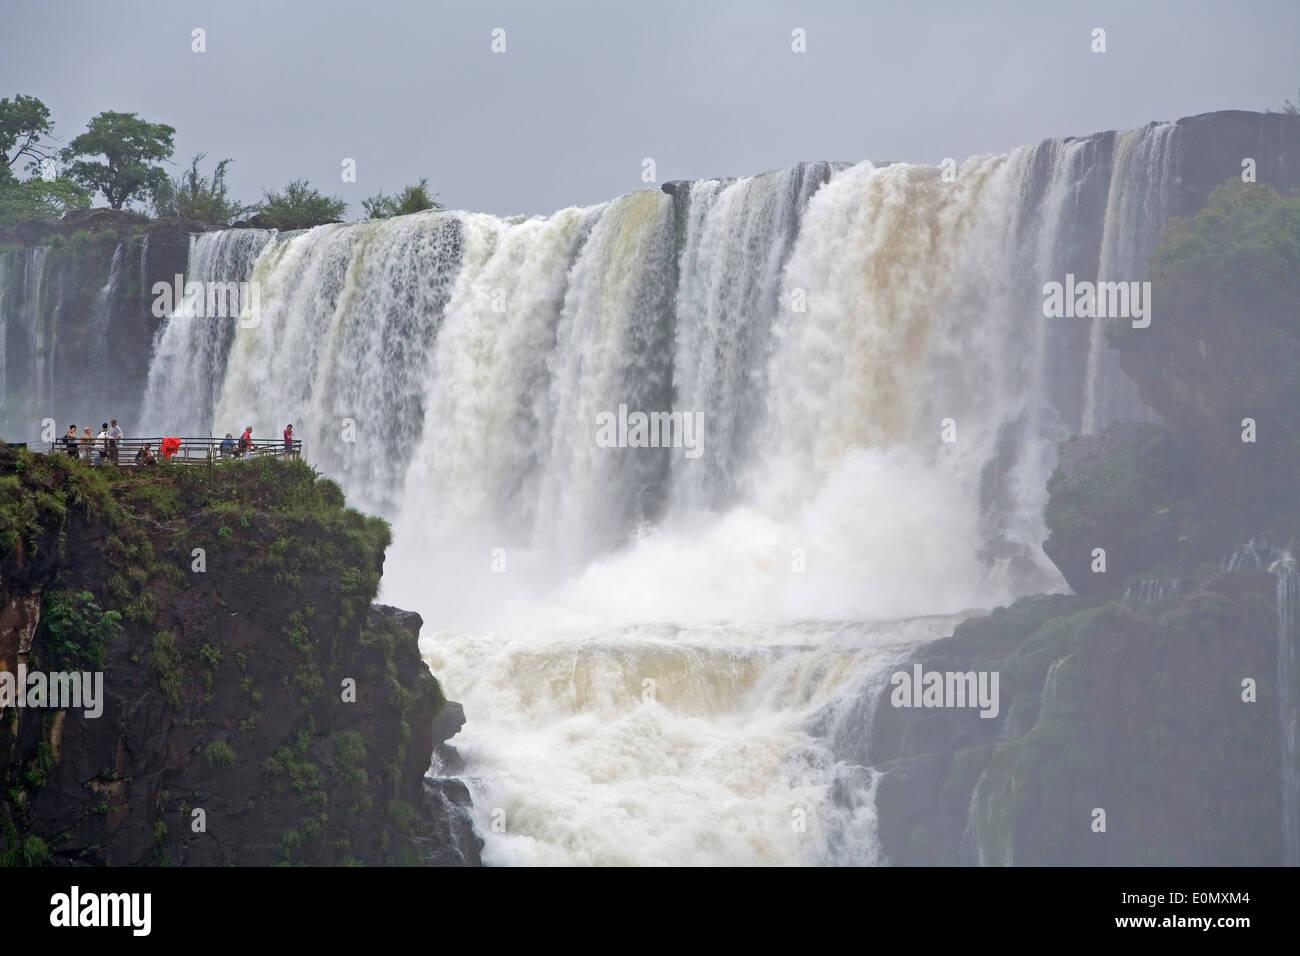 People on San Martin Island overlooking San Martin Waterfalls, Iguazu National Park, Argentina - Stock Image